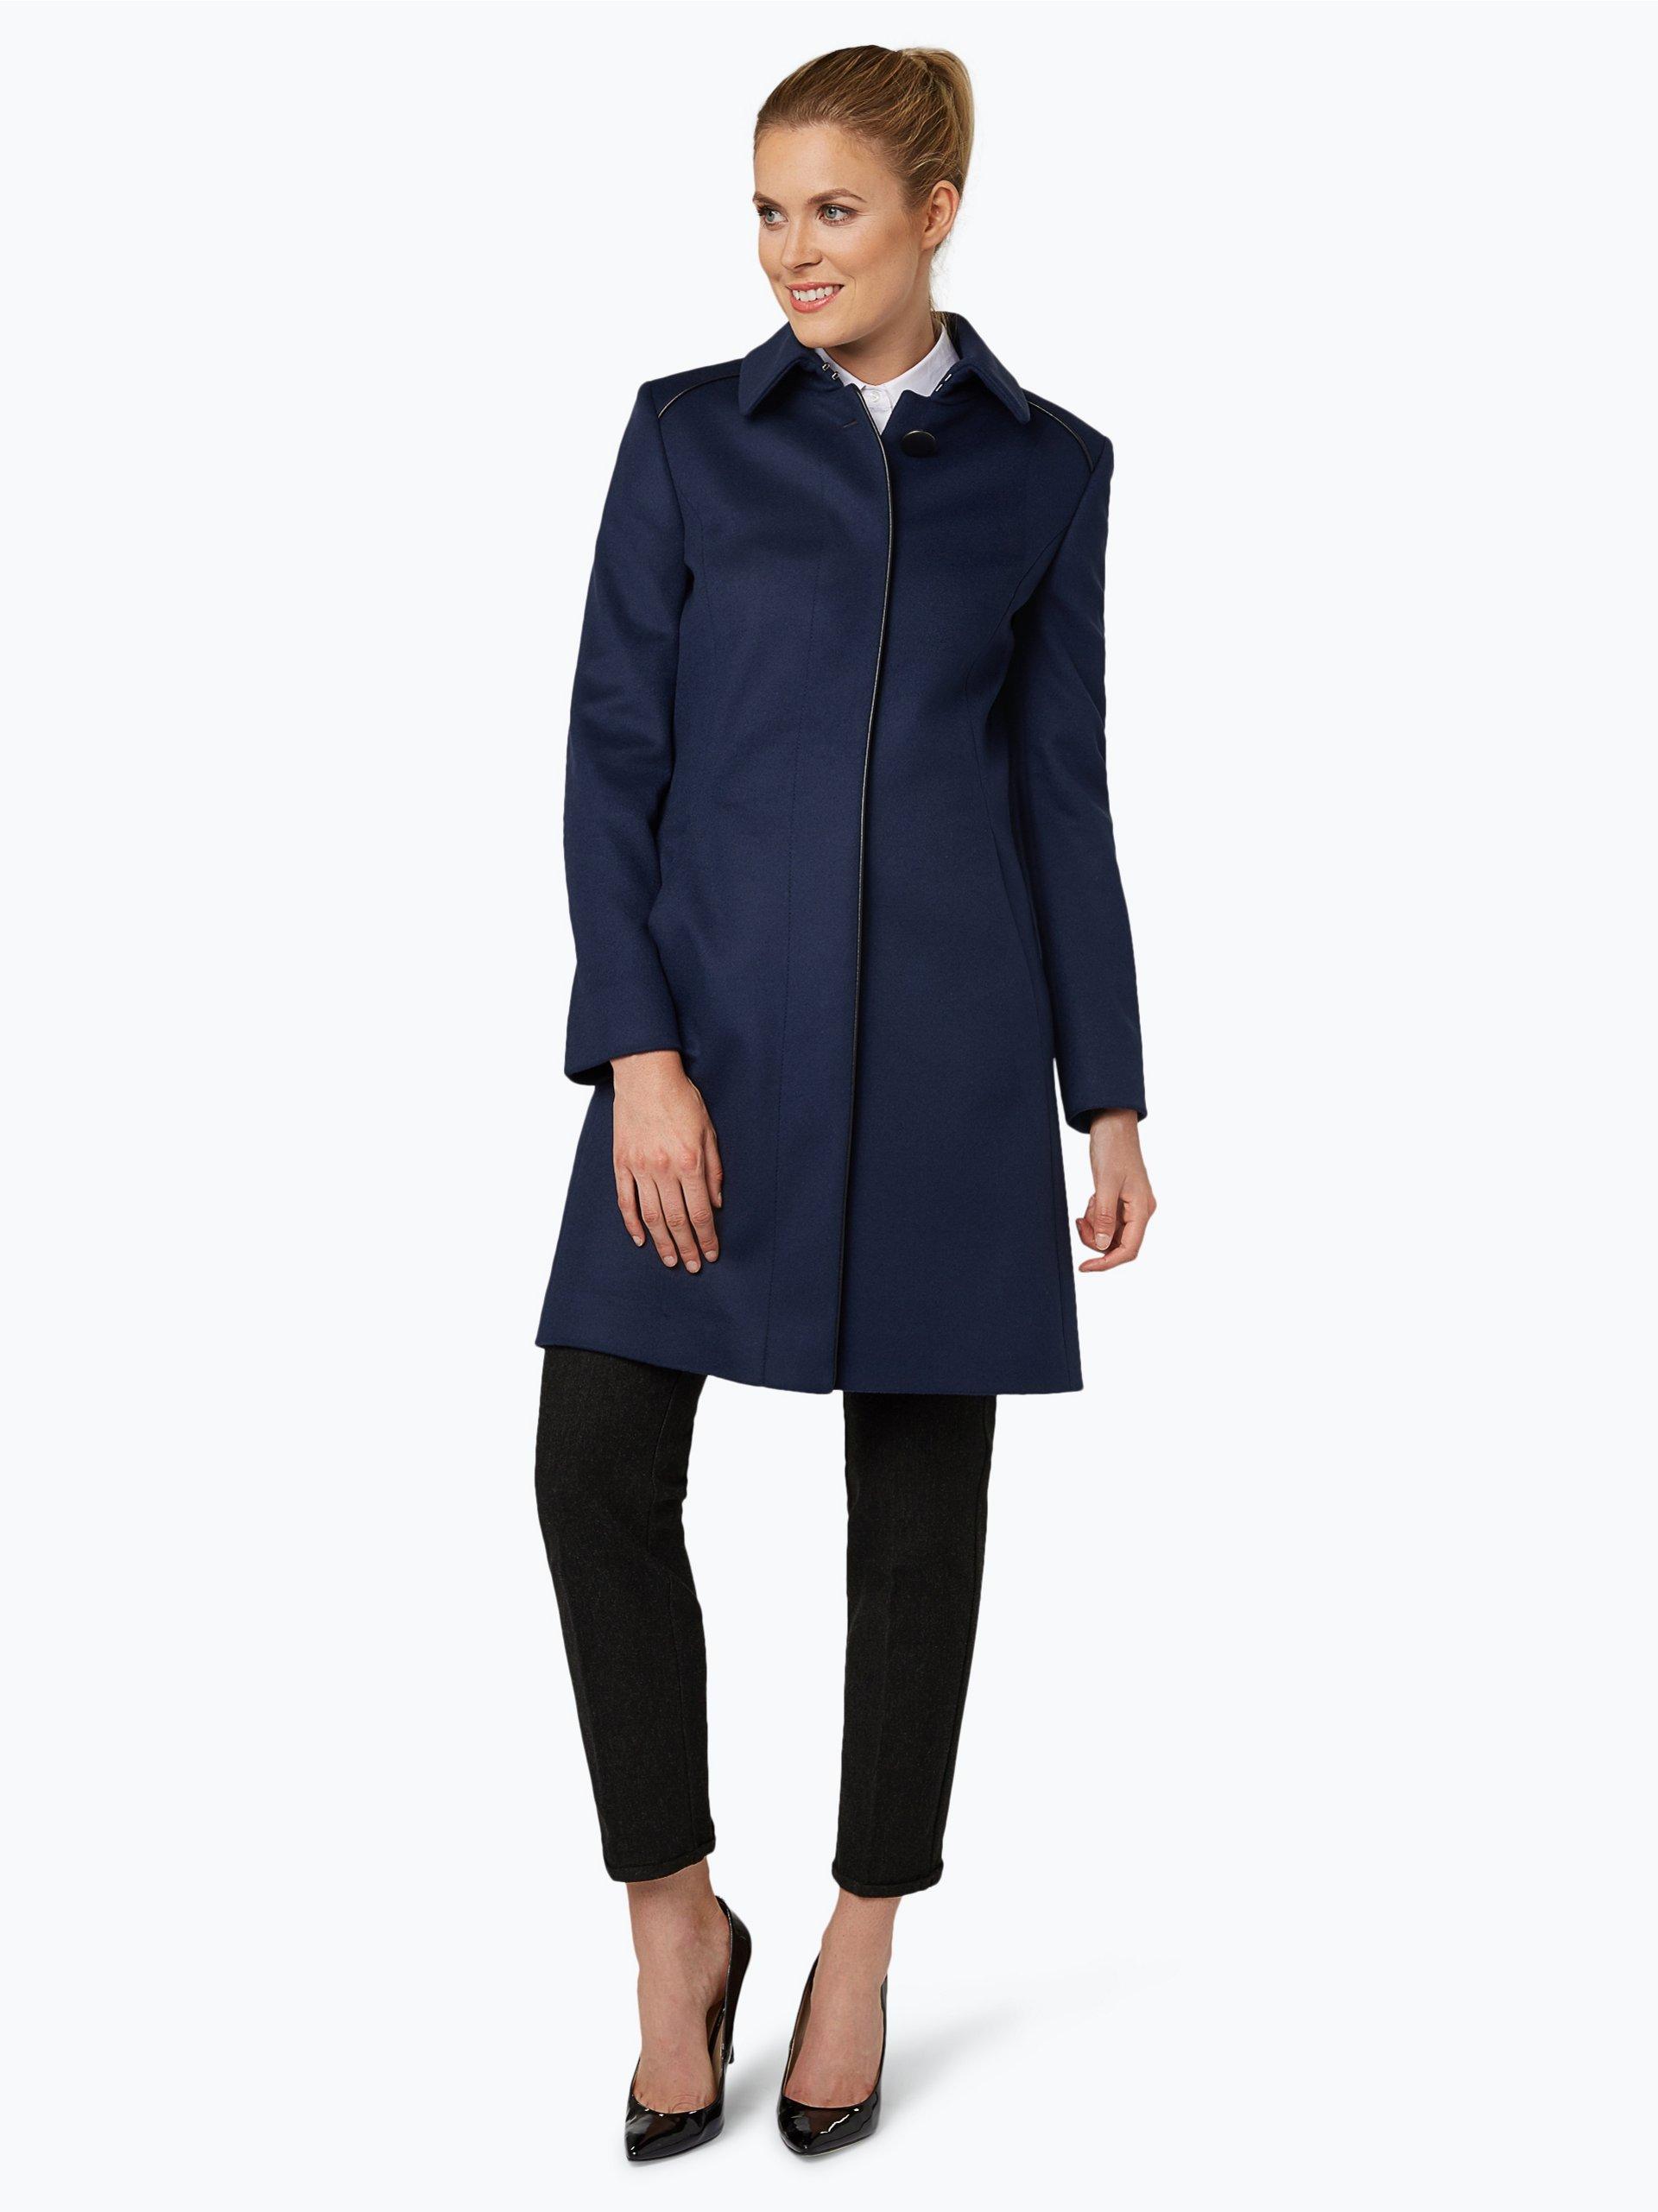 hugo damen mantel mit cashmere anteil malja marine uni online kaufen vangraaf com. Black Bedroom Furniture Sets. Home Design Ideas